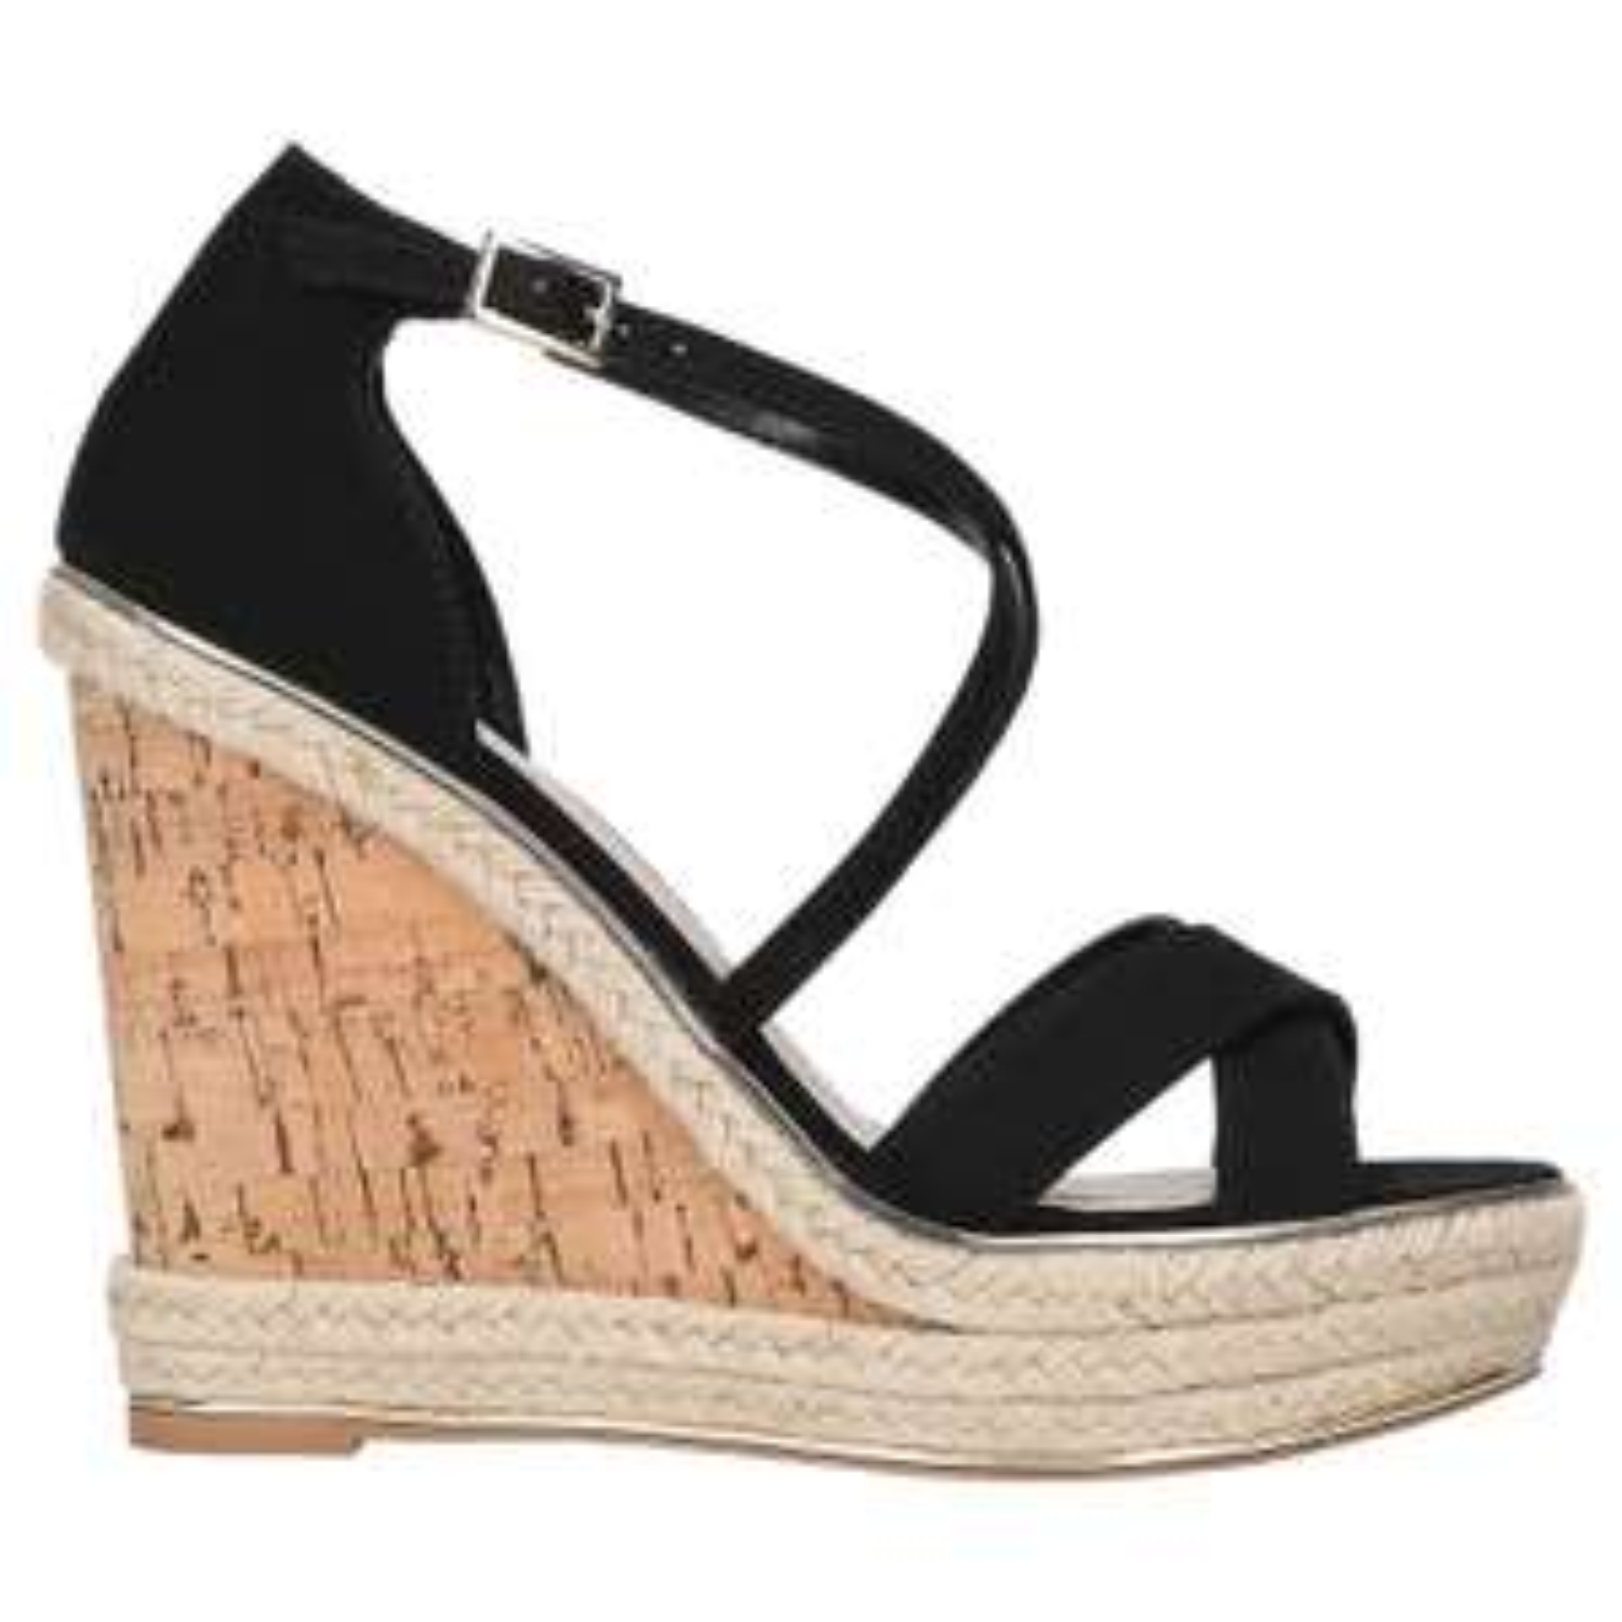 Carvela Sublime Wedge Heel Sandals, Black - Sizes 4,5,6 Available - £19 @ John Lewis & Partners (+£3.50 Delivery)